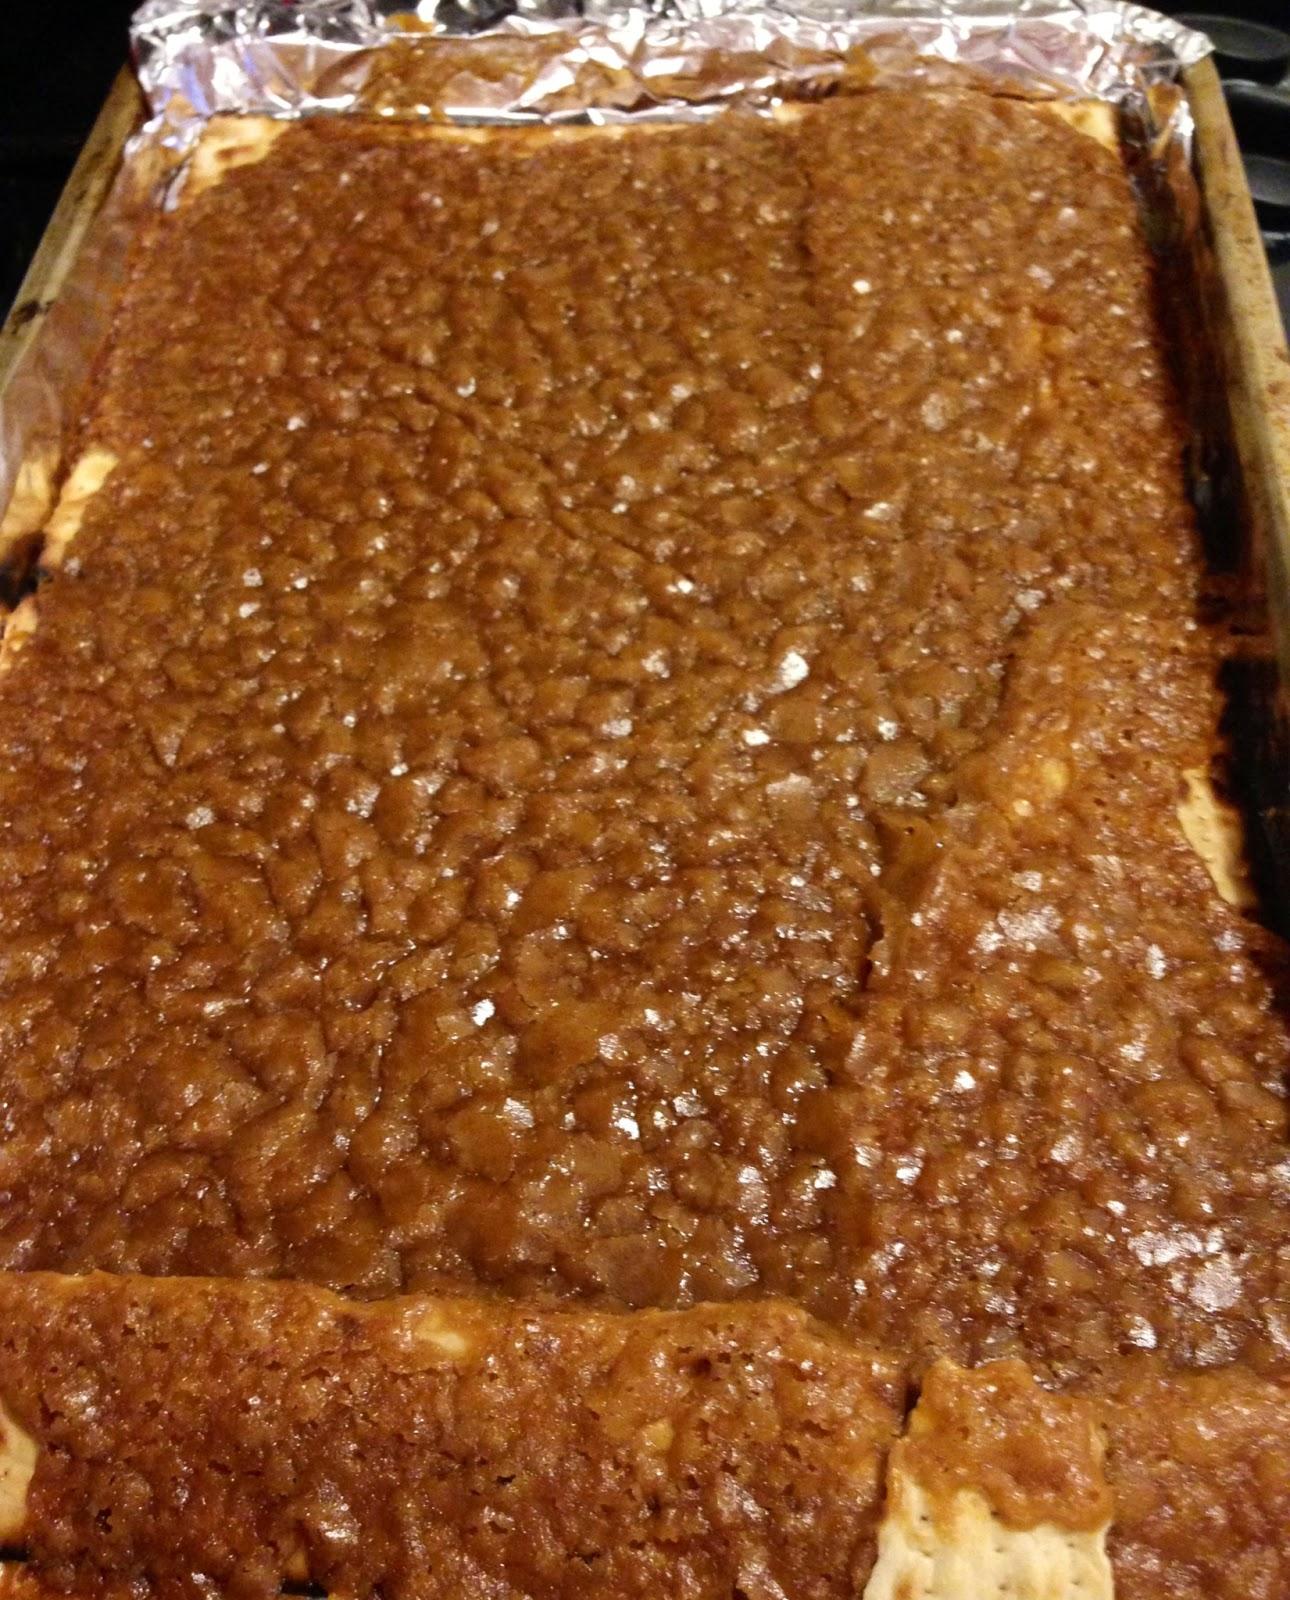 Matzoh Crunch aka Matzoh Crack aka Chocolate & Caramel Covered Matzoh ...